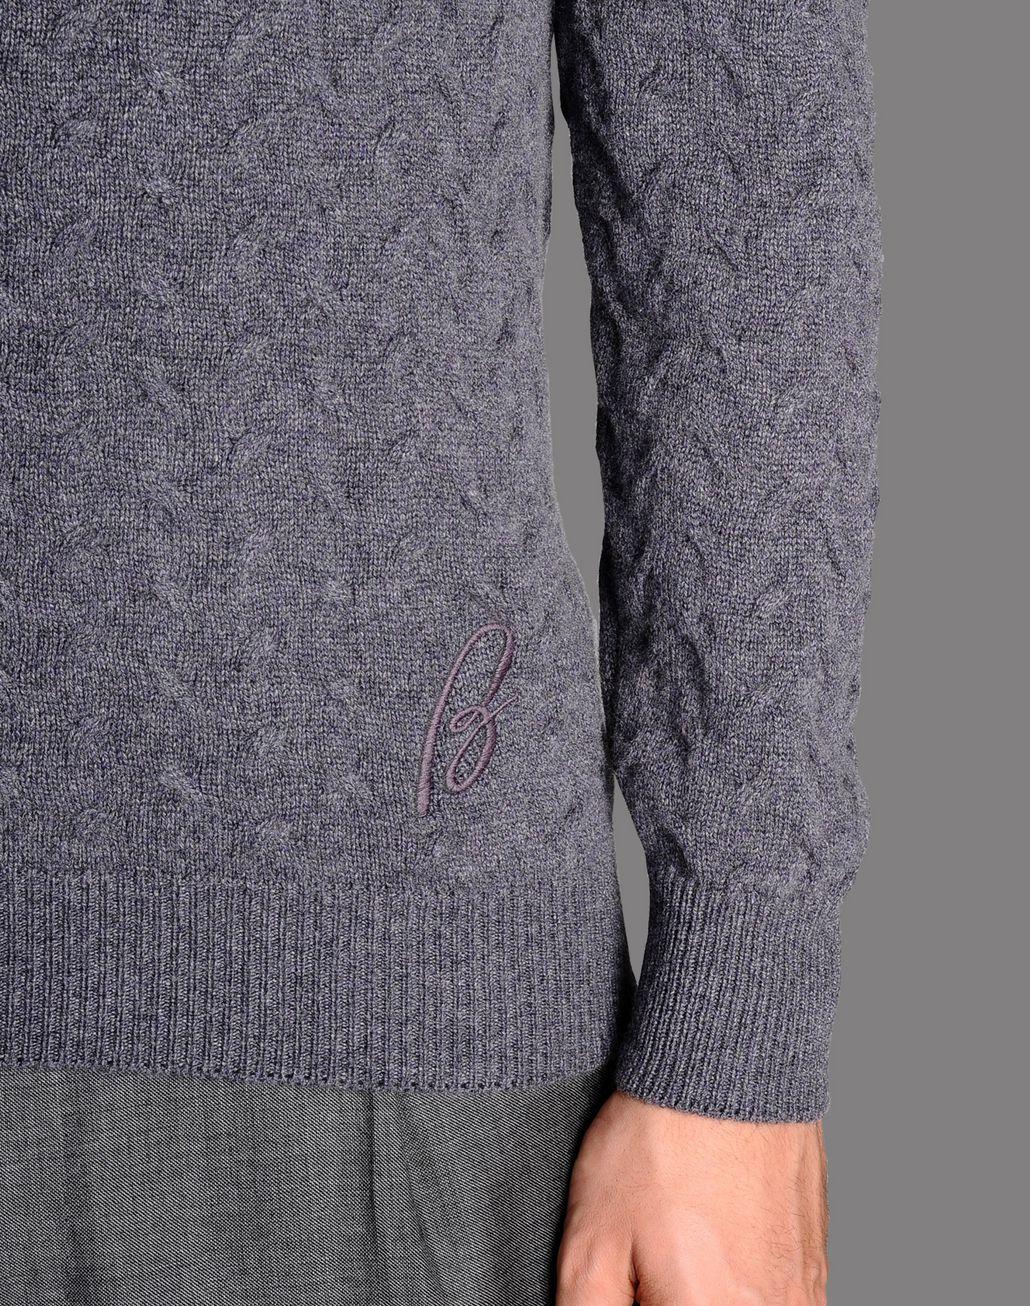 BRIONI cable knit cashmere jumper Knitwear U d